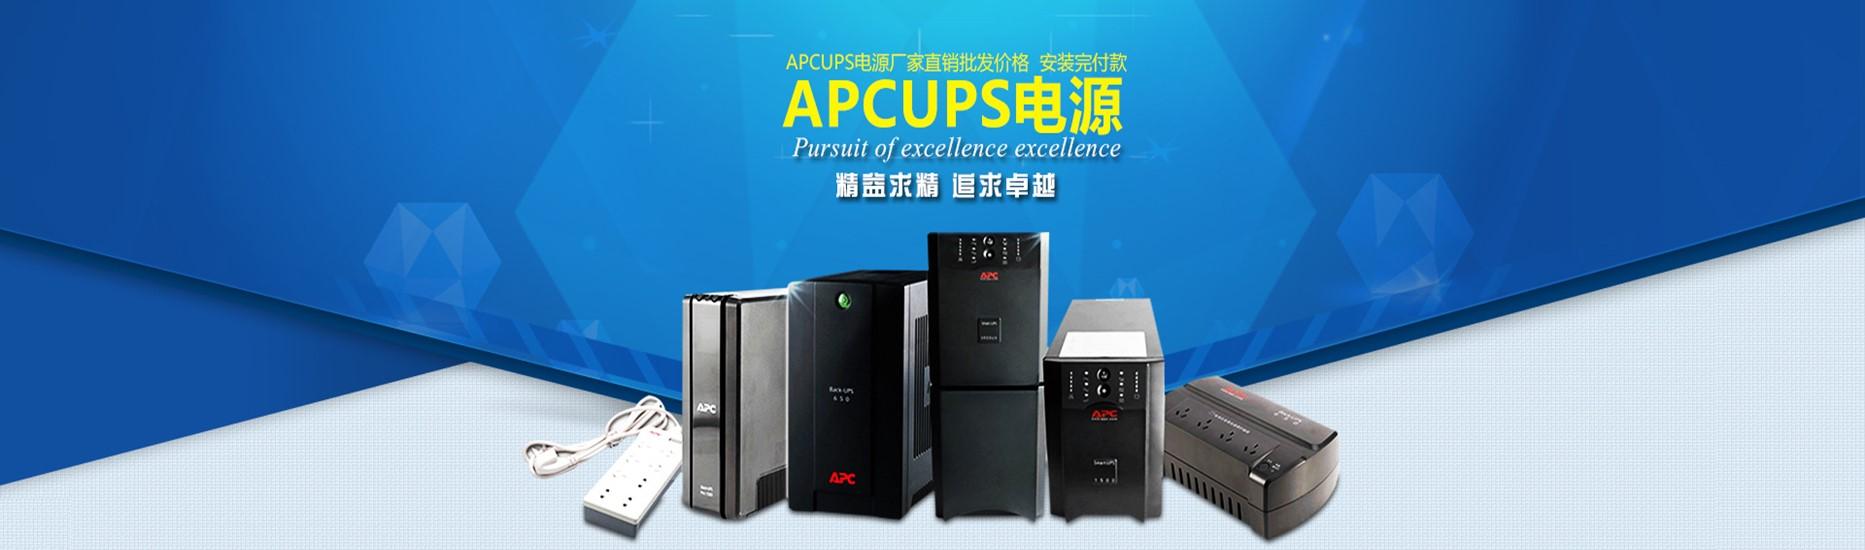 APC,UPS,电源,蓄电池,不间断